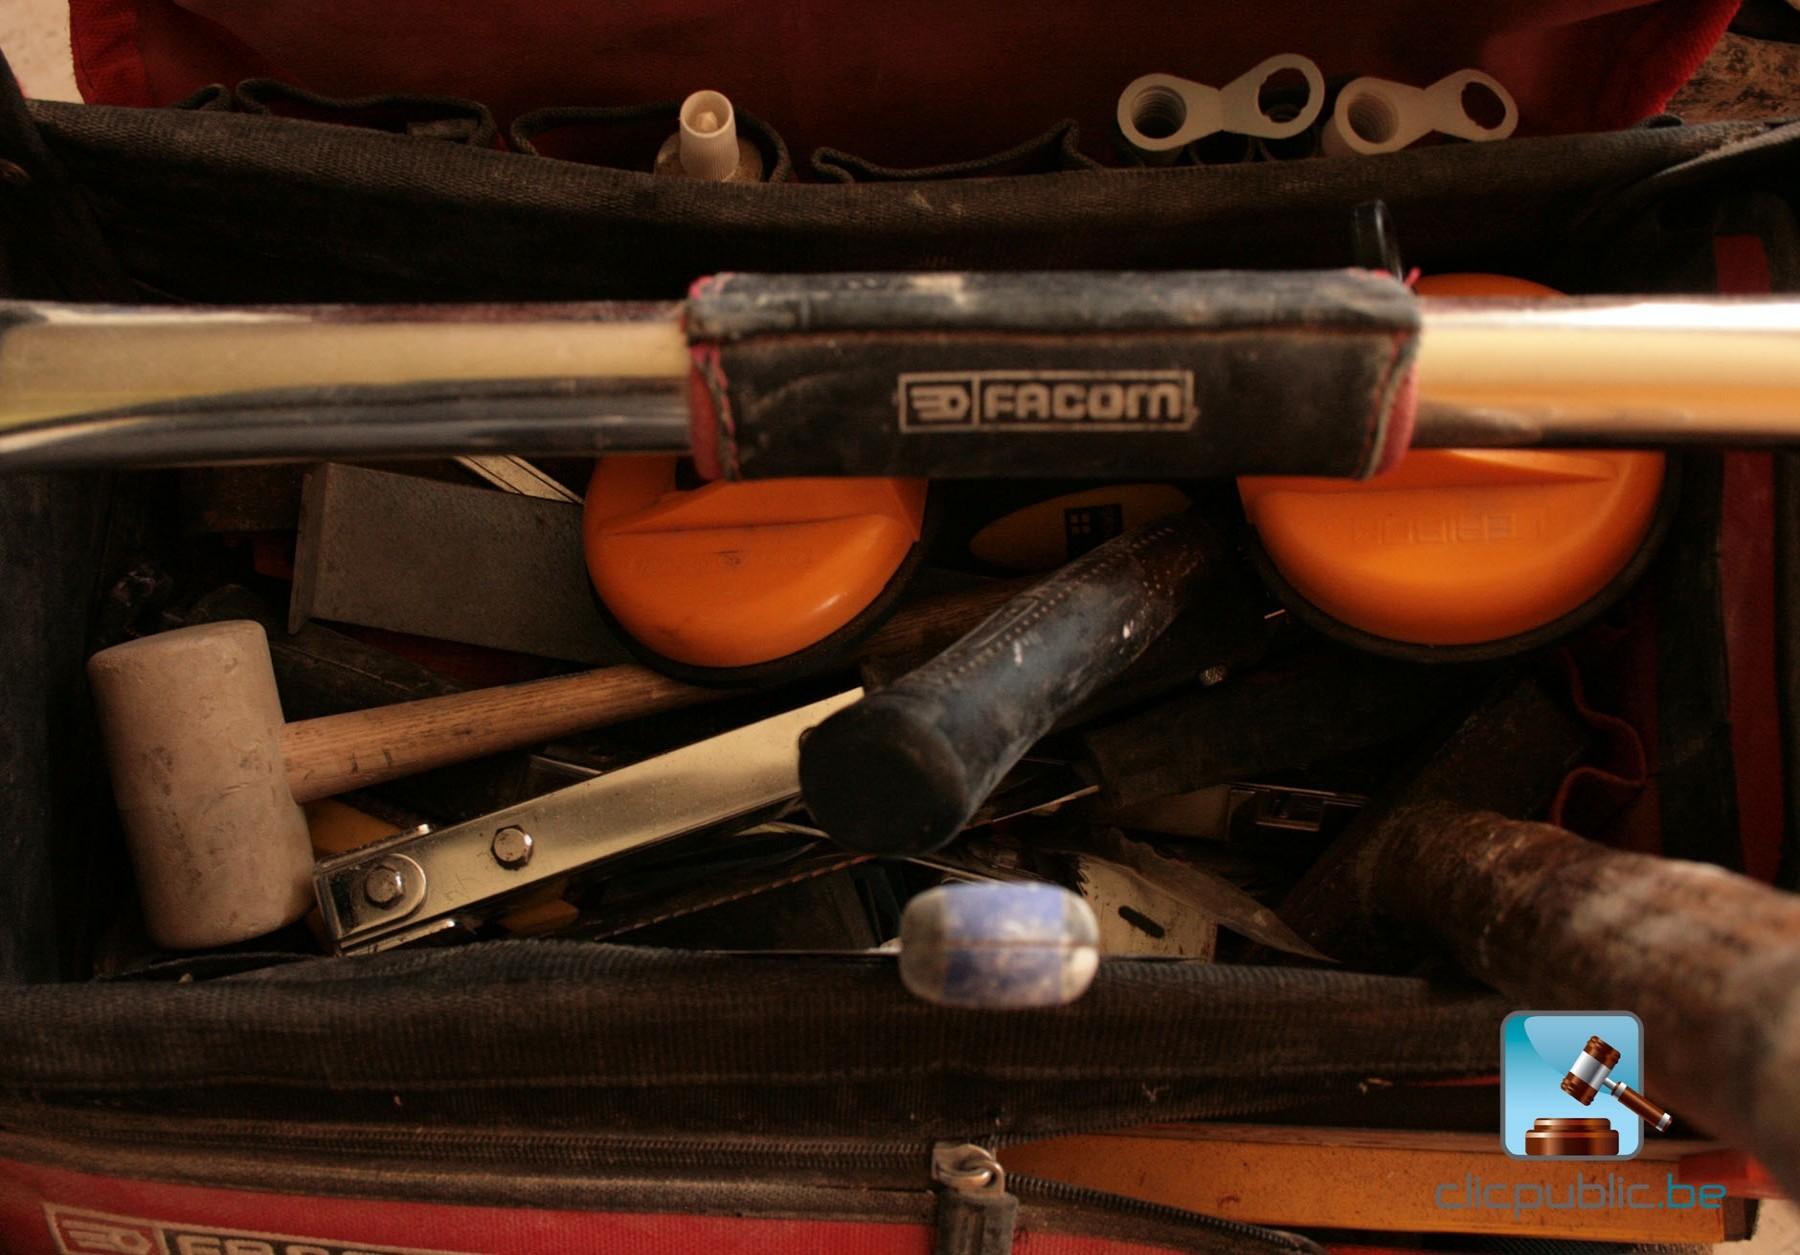 sac d 39 outils facom avec outils vendre sur. Black Bedroom Furniture Sets. Home Design Ideas